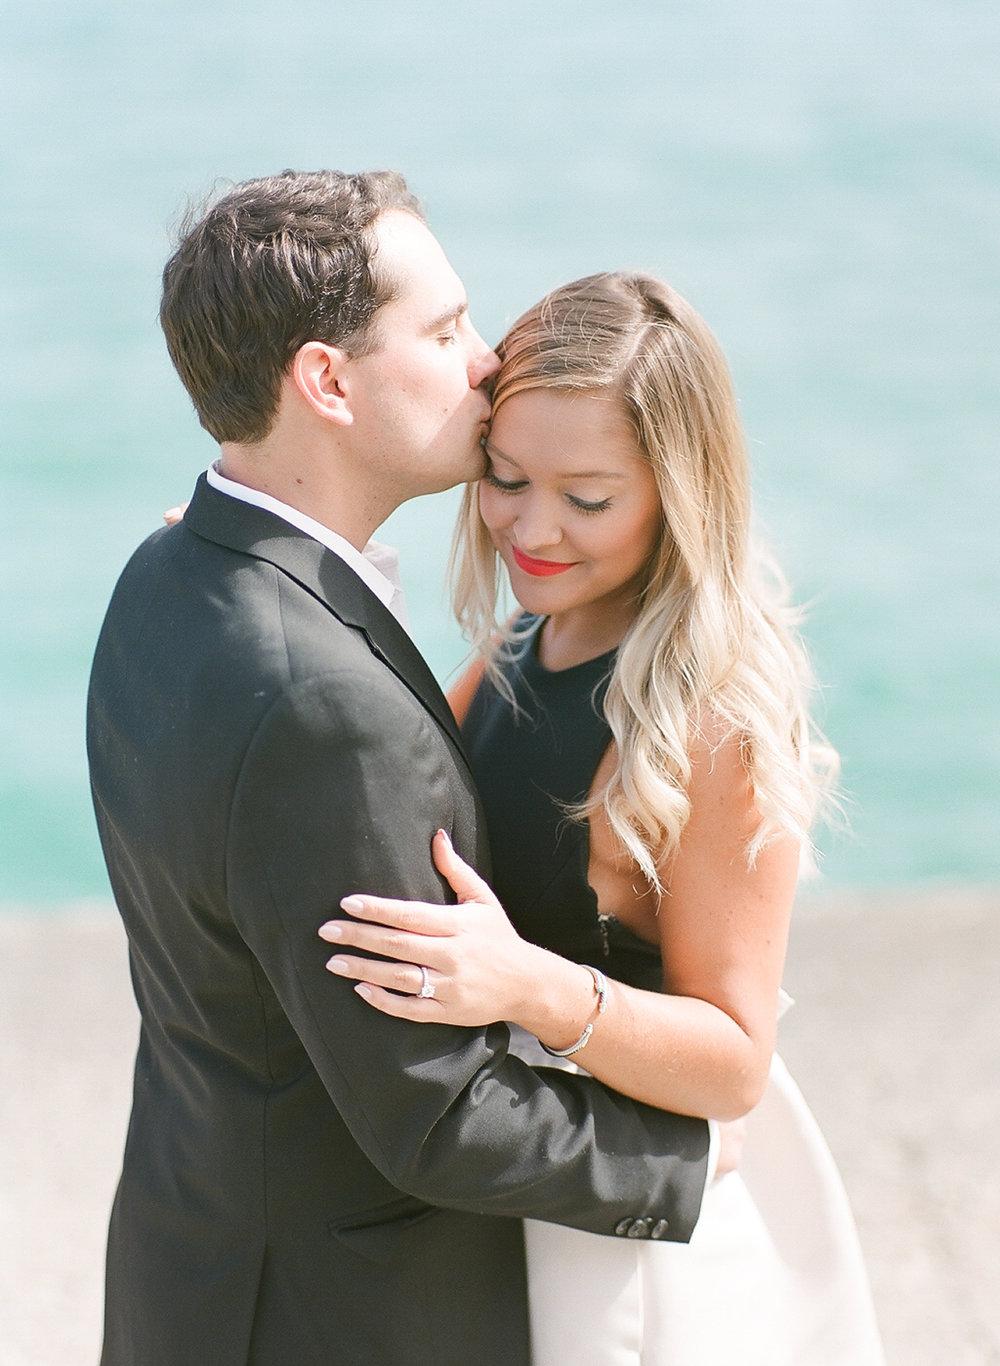 Bonphotage Fine Art Wedding Photography - Chicago